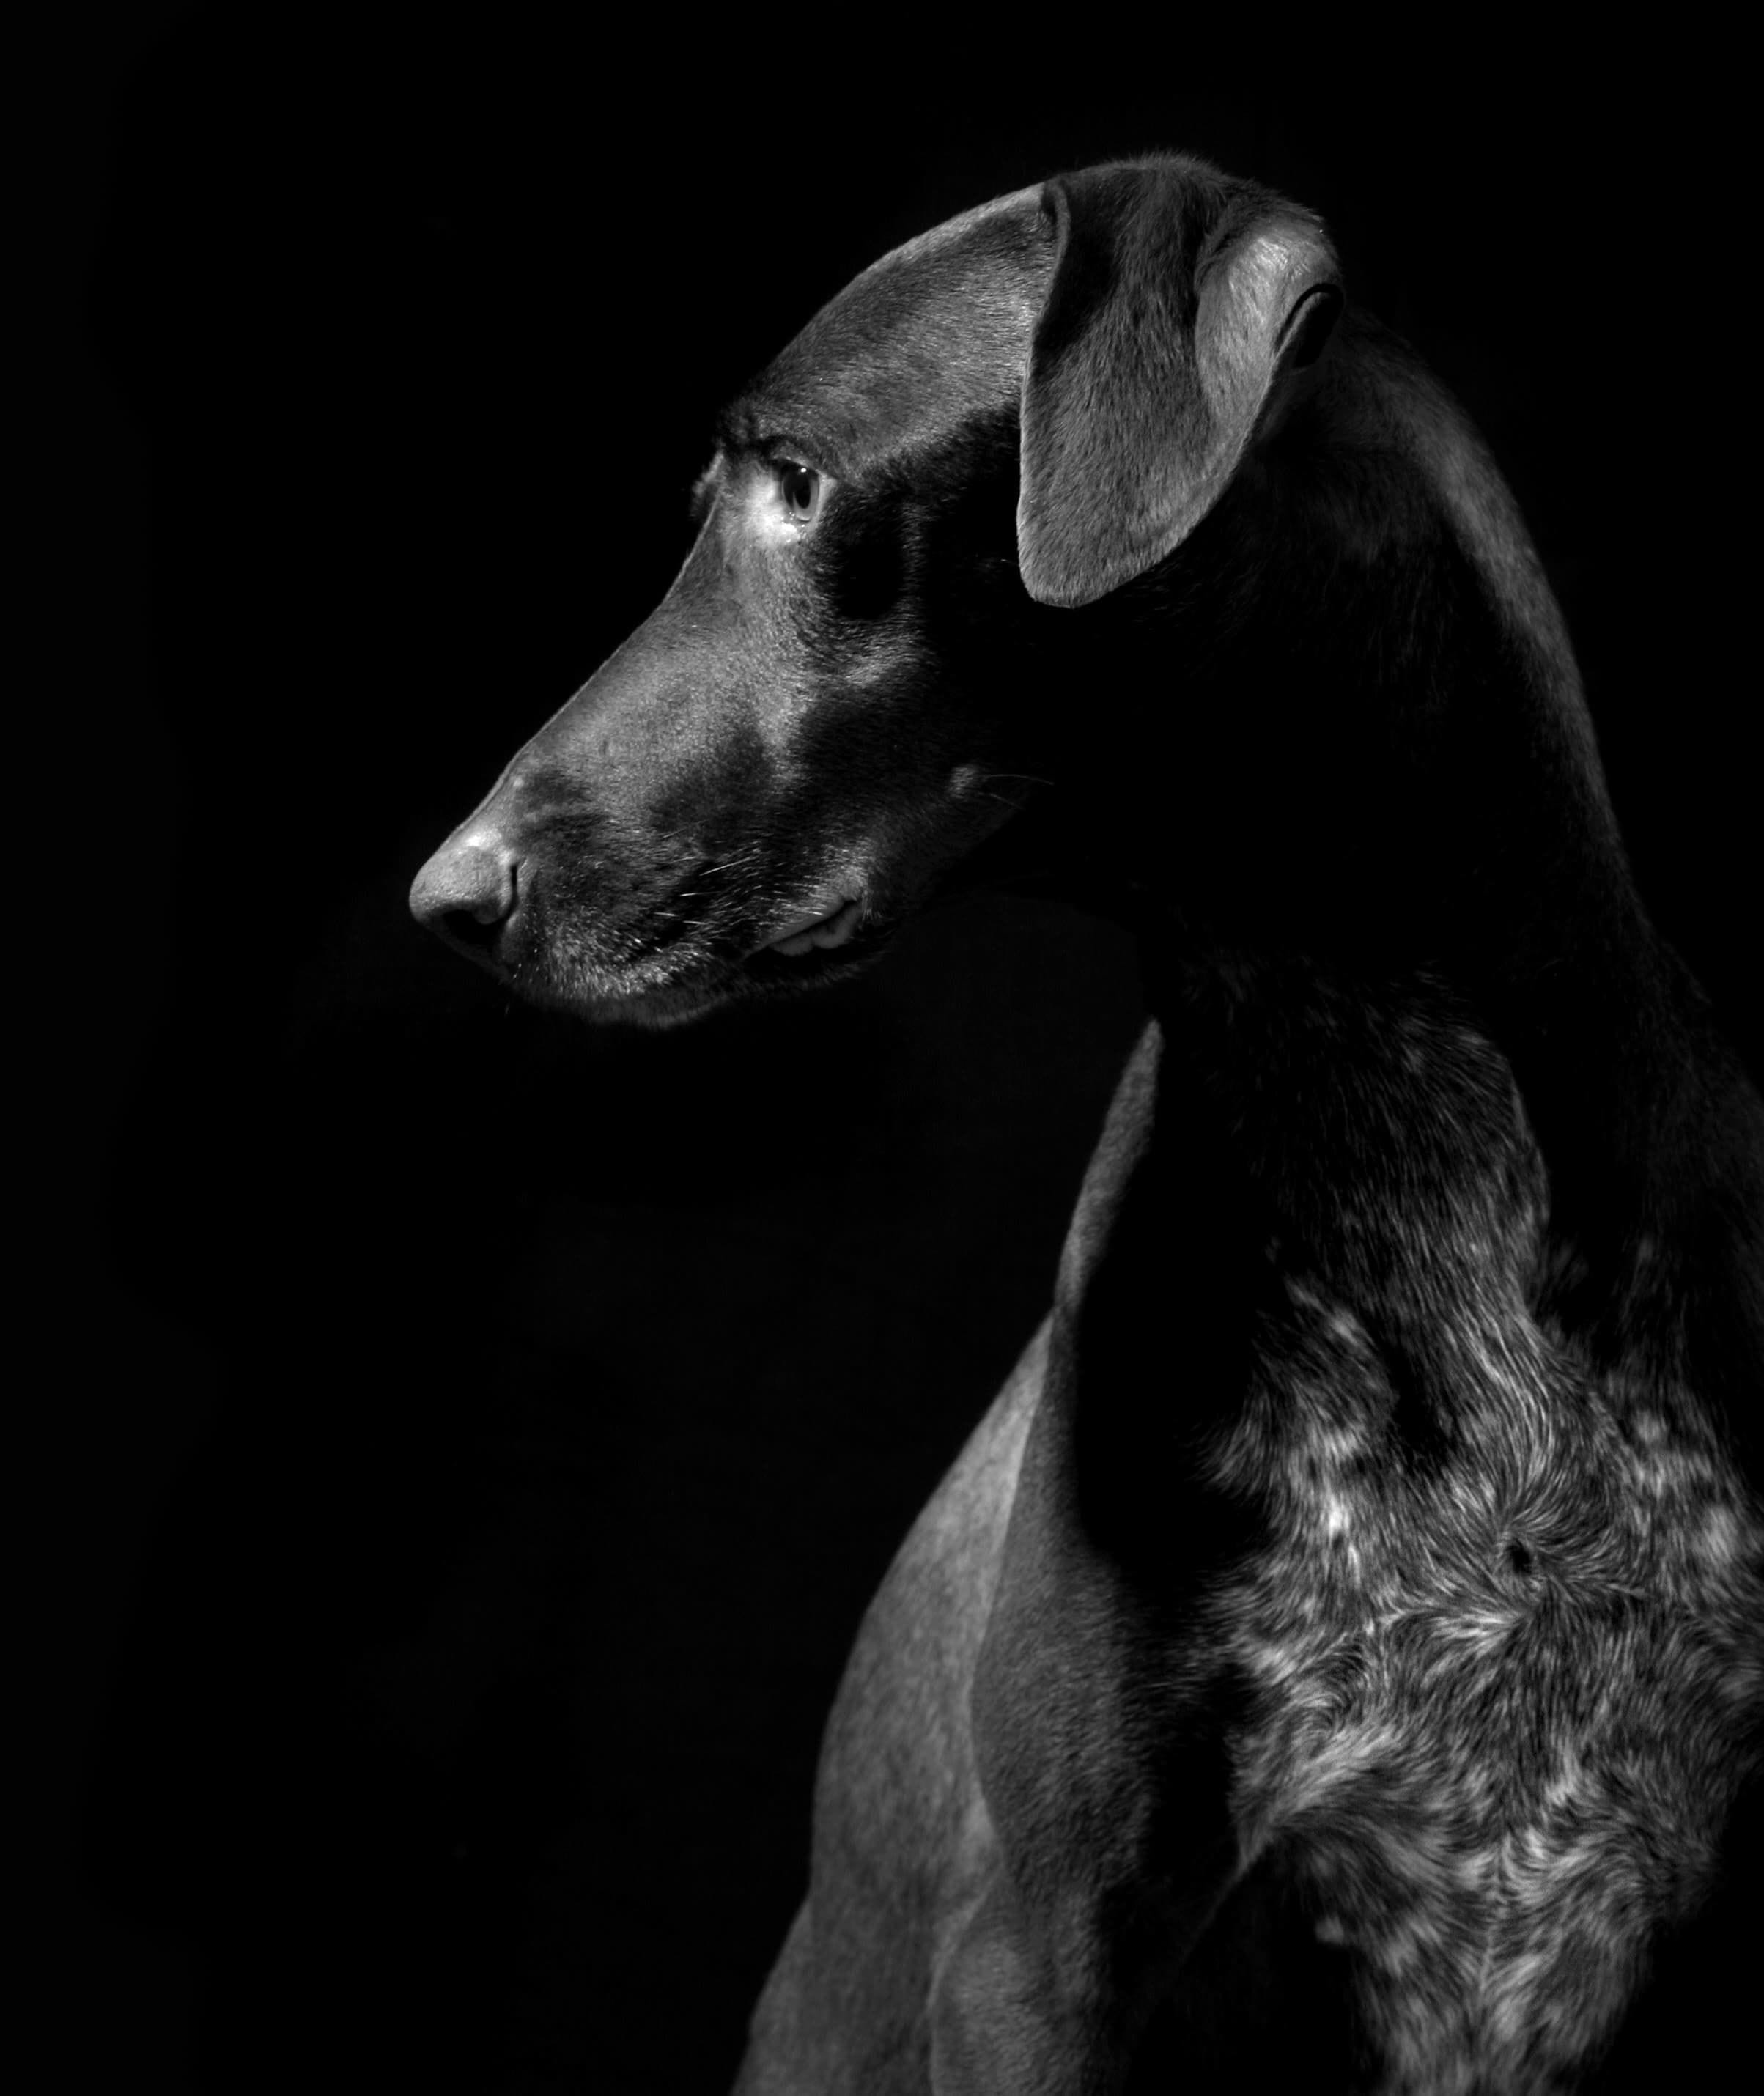 Sleek black dog at The Heights at Park Lane in Dallas, Texas